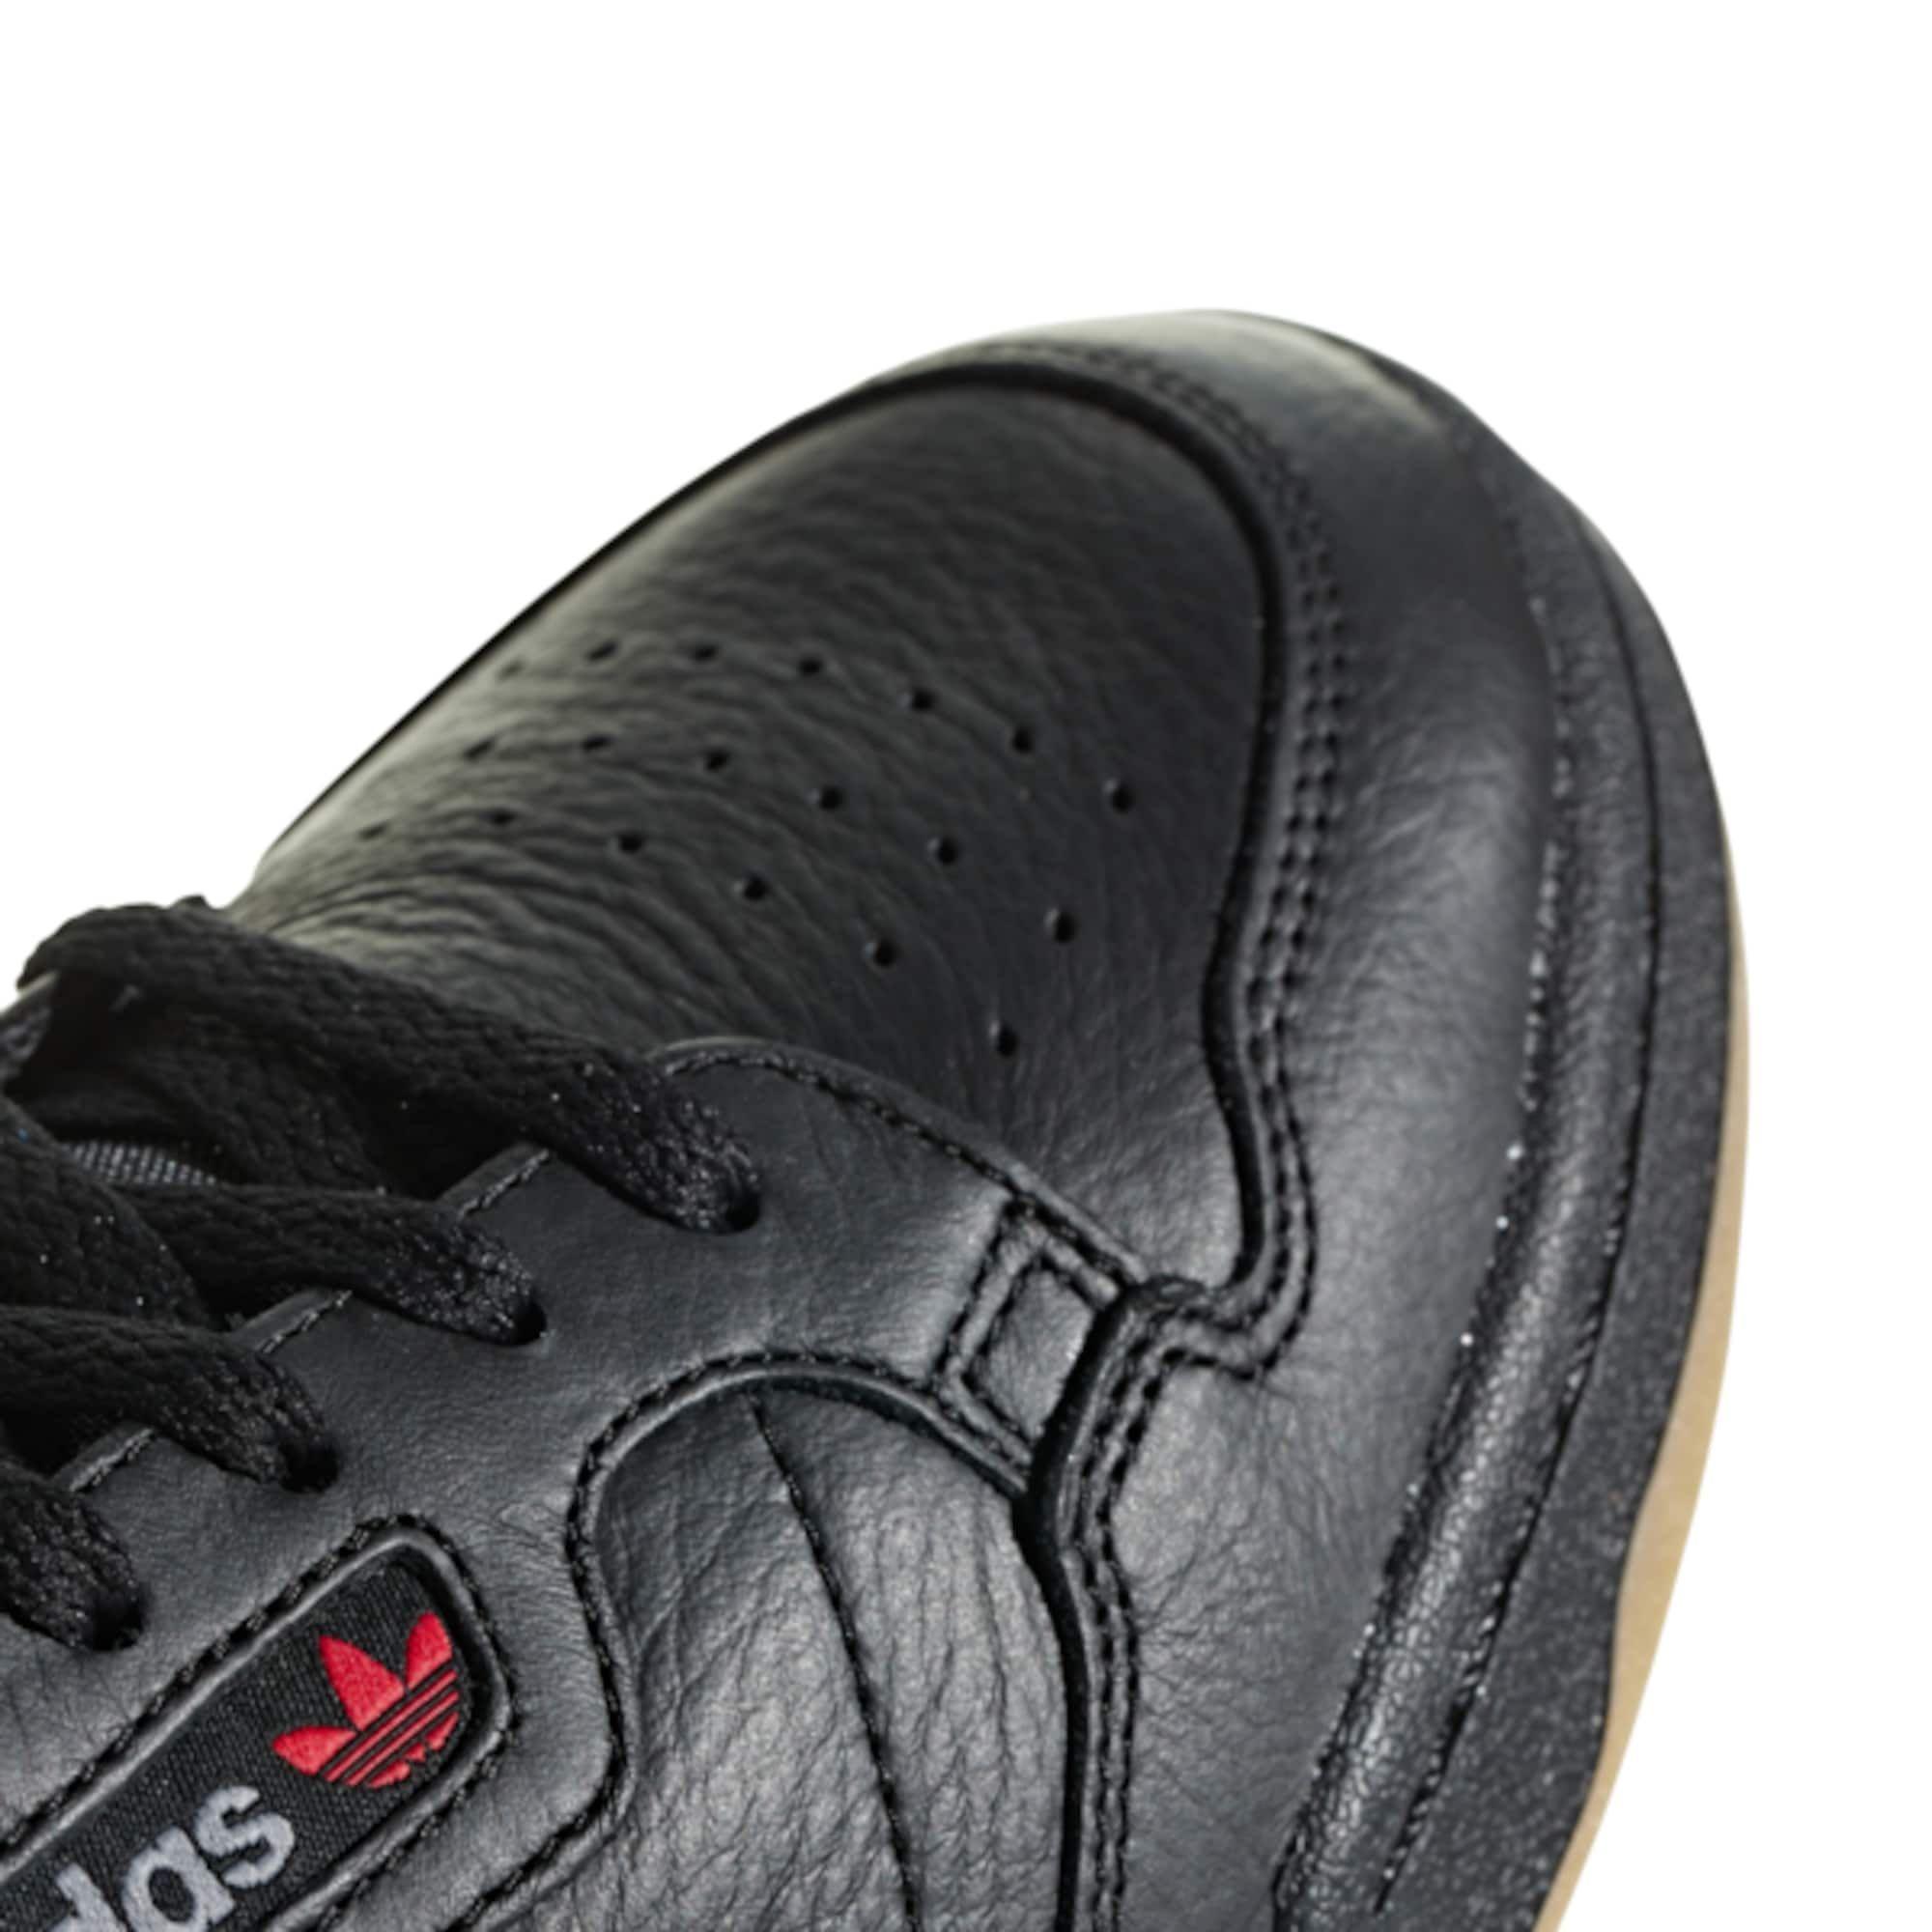 Adidas Originals Sneaker Continental 80 Herren Grau Schwarz Grosse 37 5 38 Adidas Originals Sneaker Adidas Originals Und Adidas